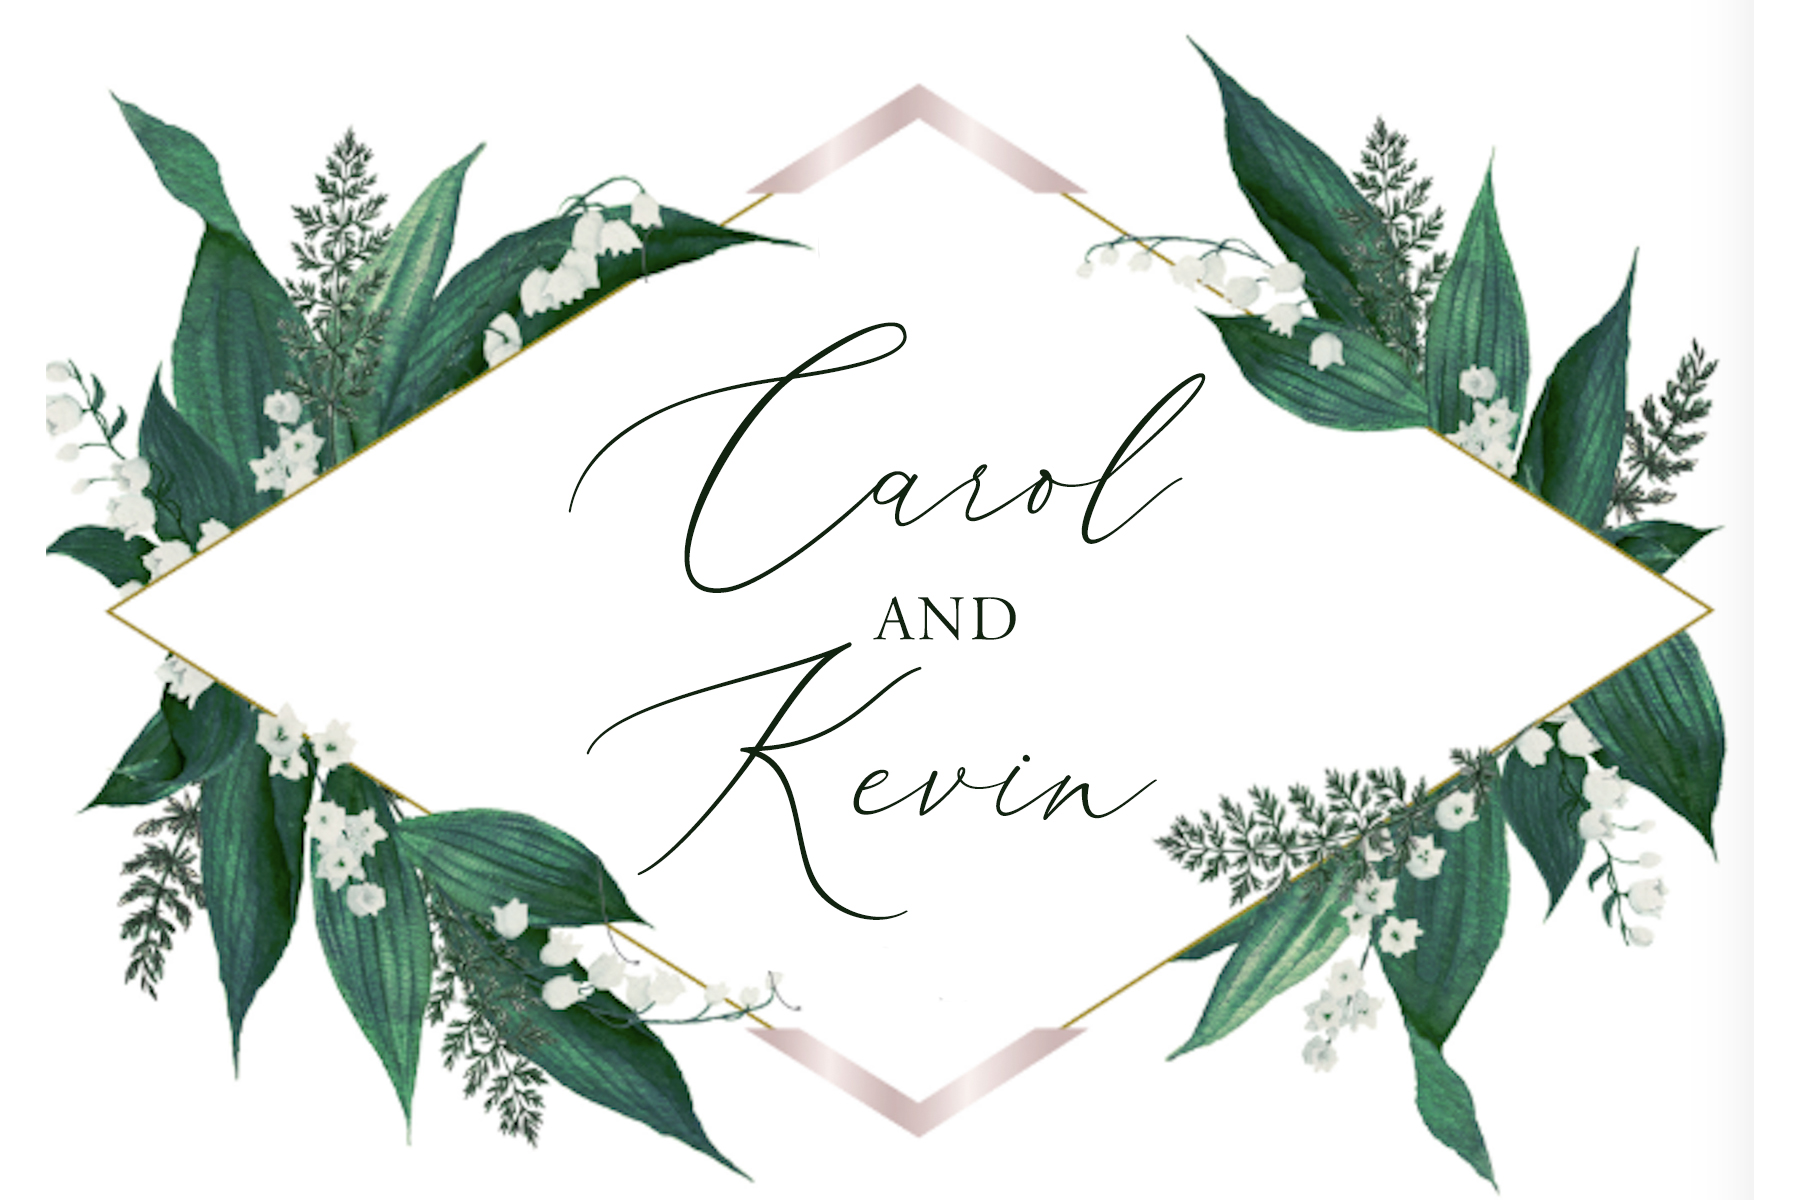 carol and kevin logo001.jpg